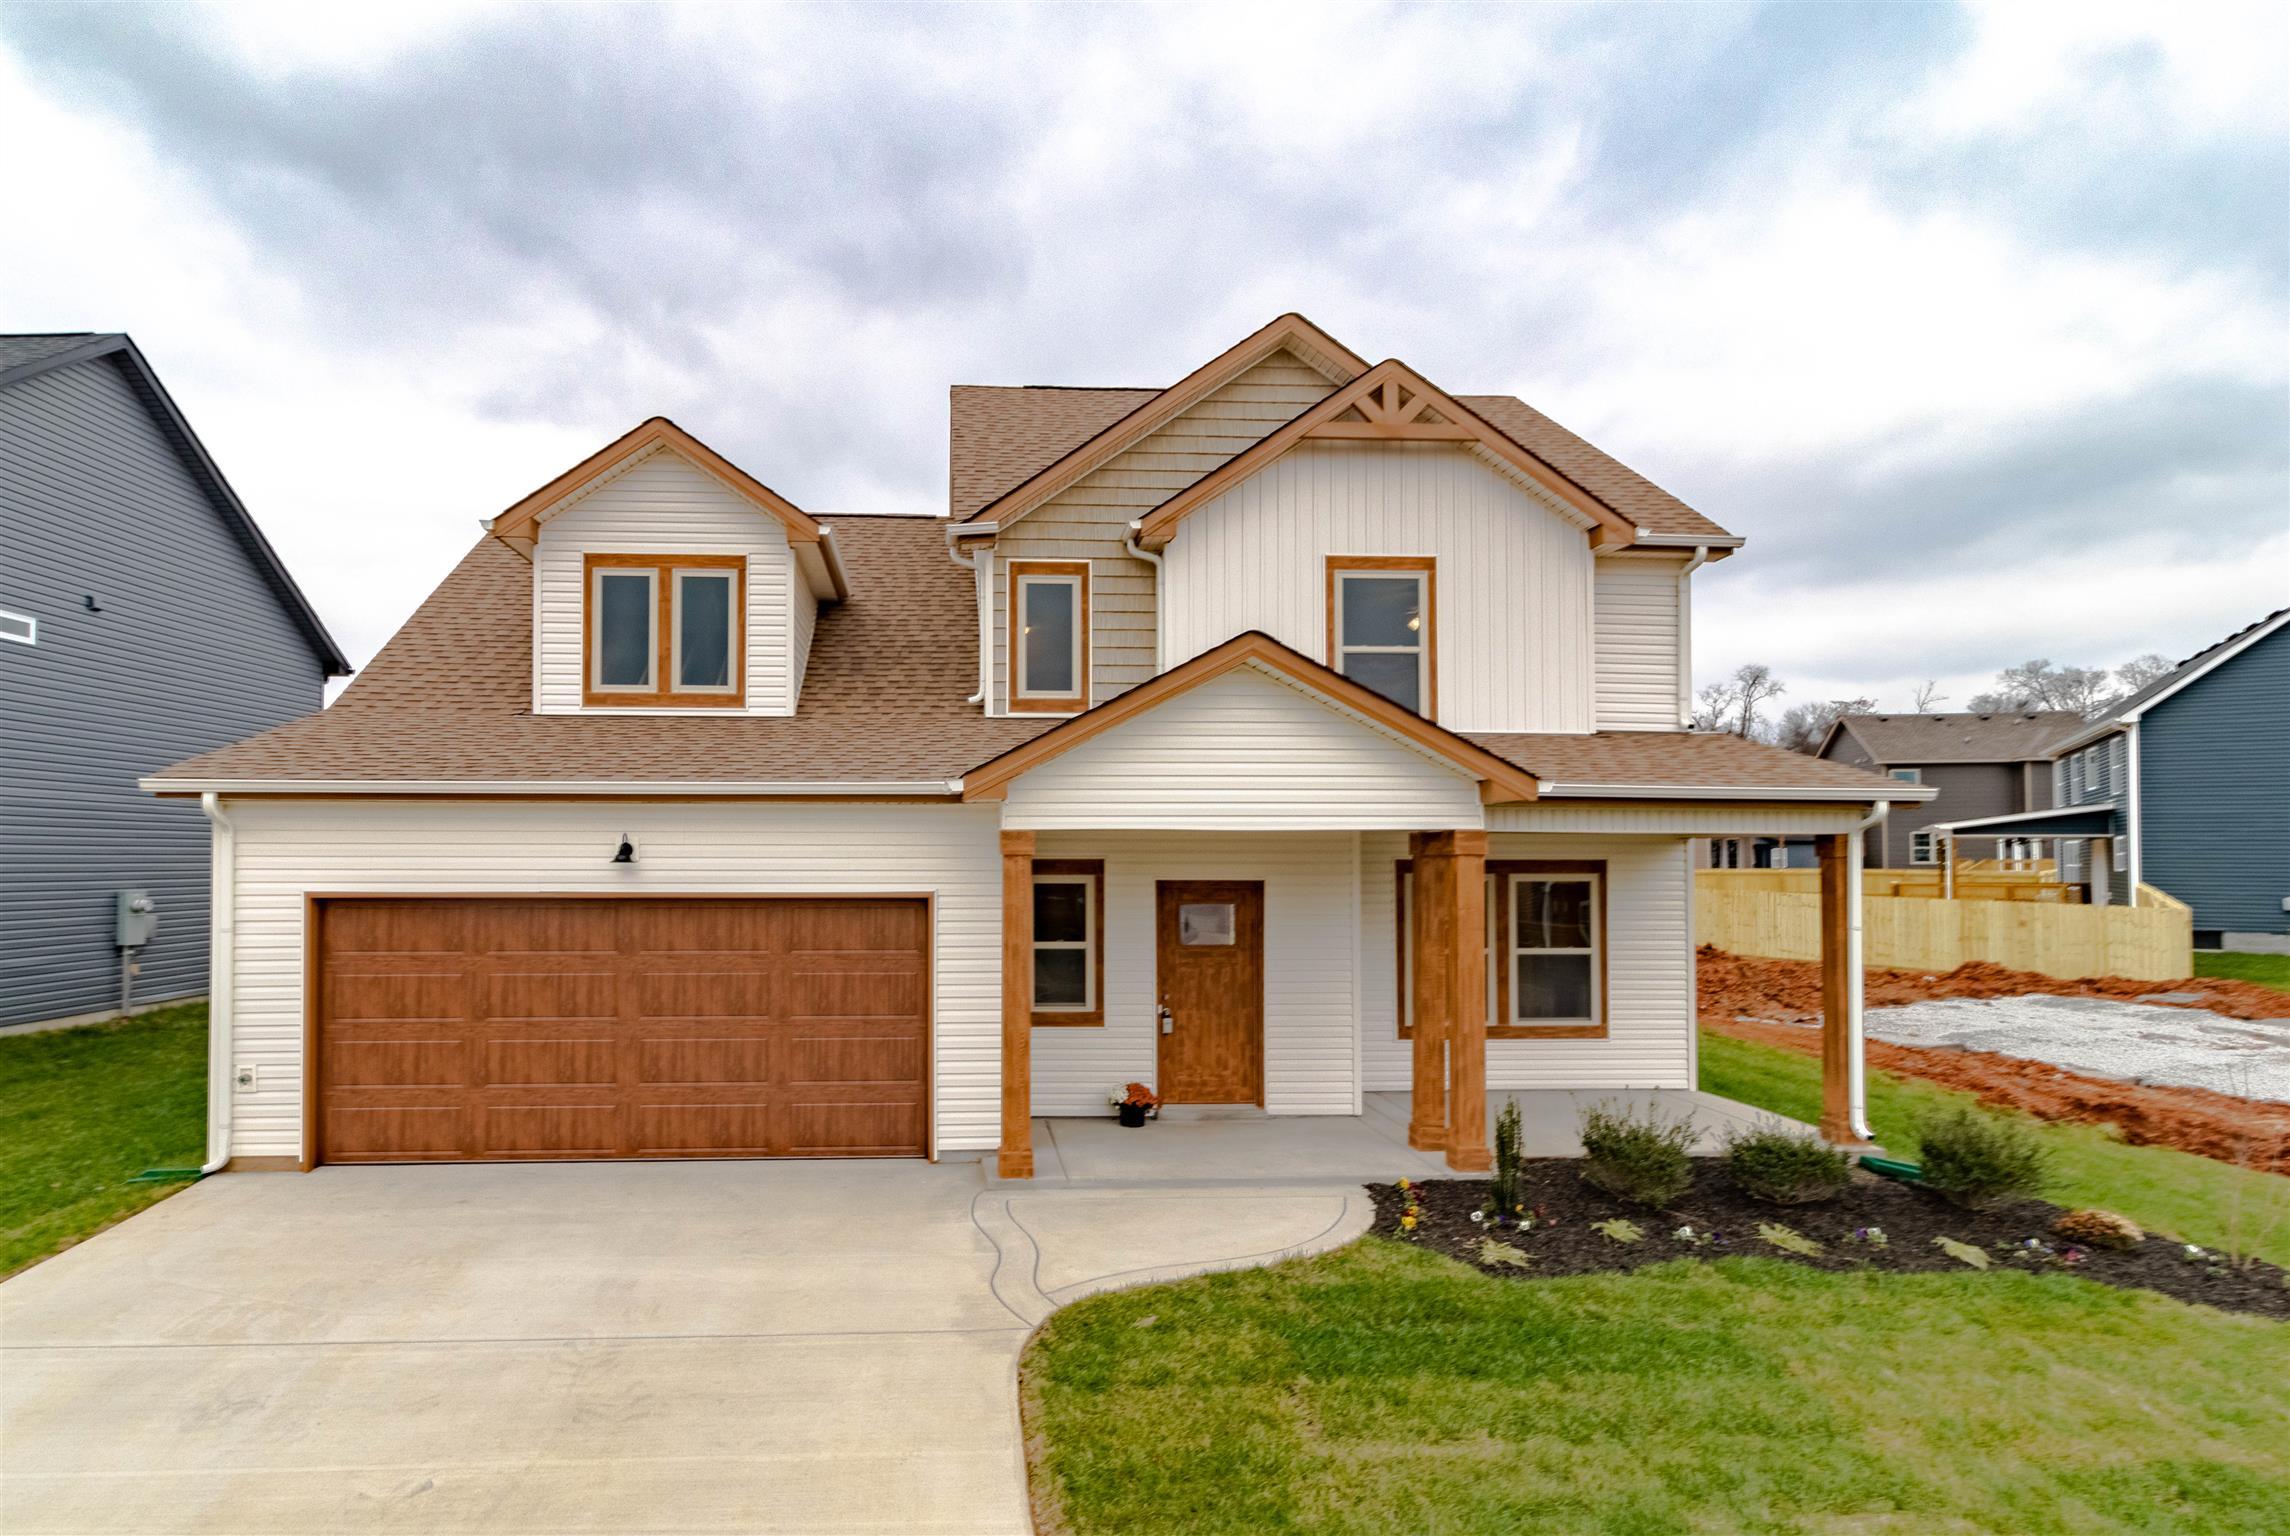 105 Eagles Bluff, Clarksville, TN 37040 - Clarksville, TN real estate listing